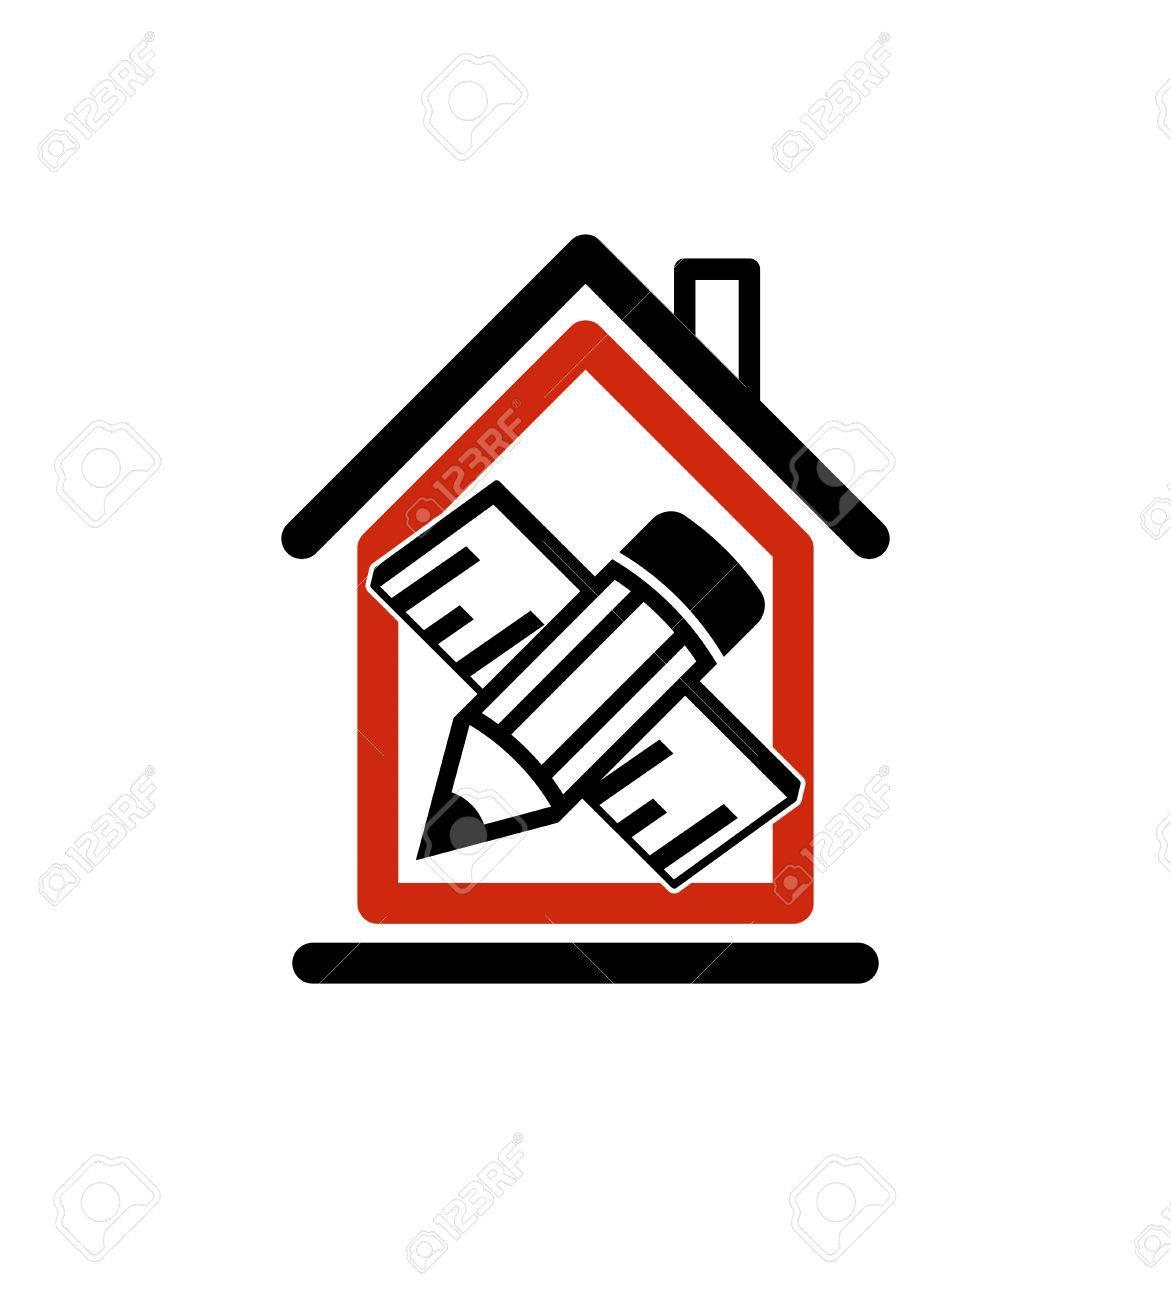 Attractive Architectural Design Conceptual Symbol, Simple Vector House Icon With Edit  Pencil And Measuring Line.